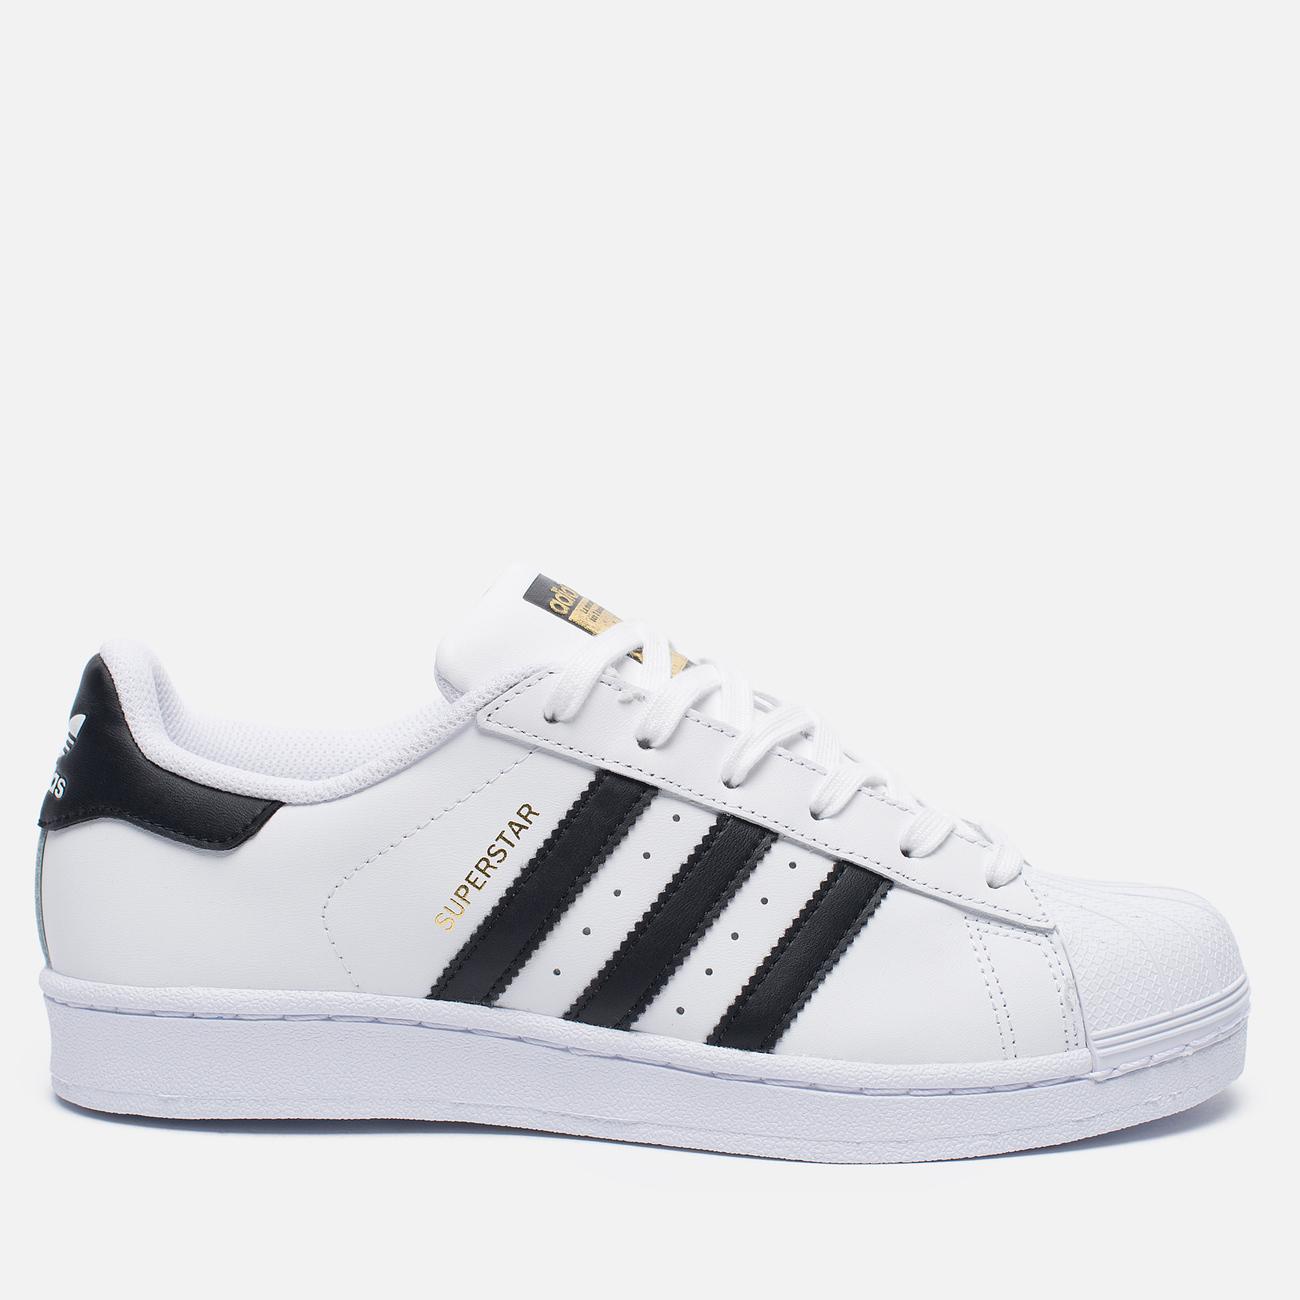 Женские кроссовки adidas Originals Superstar Running White/Black